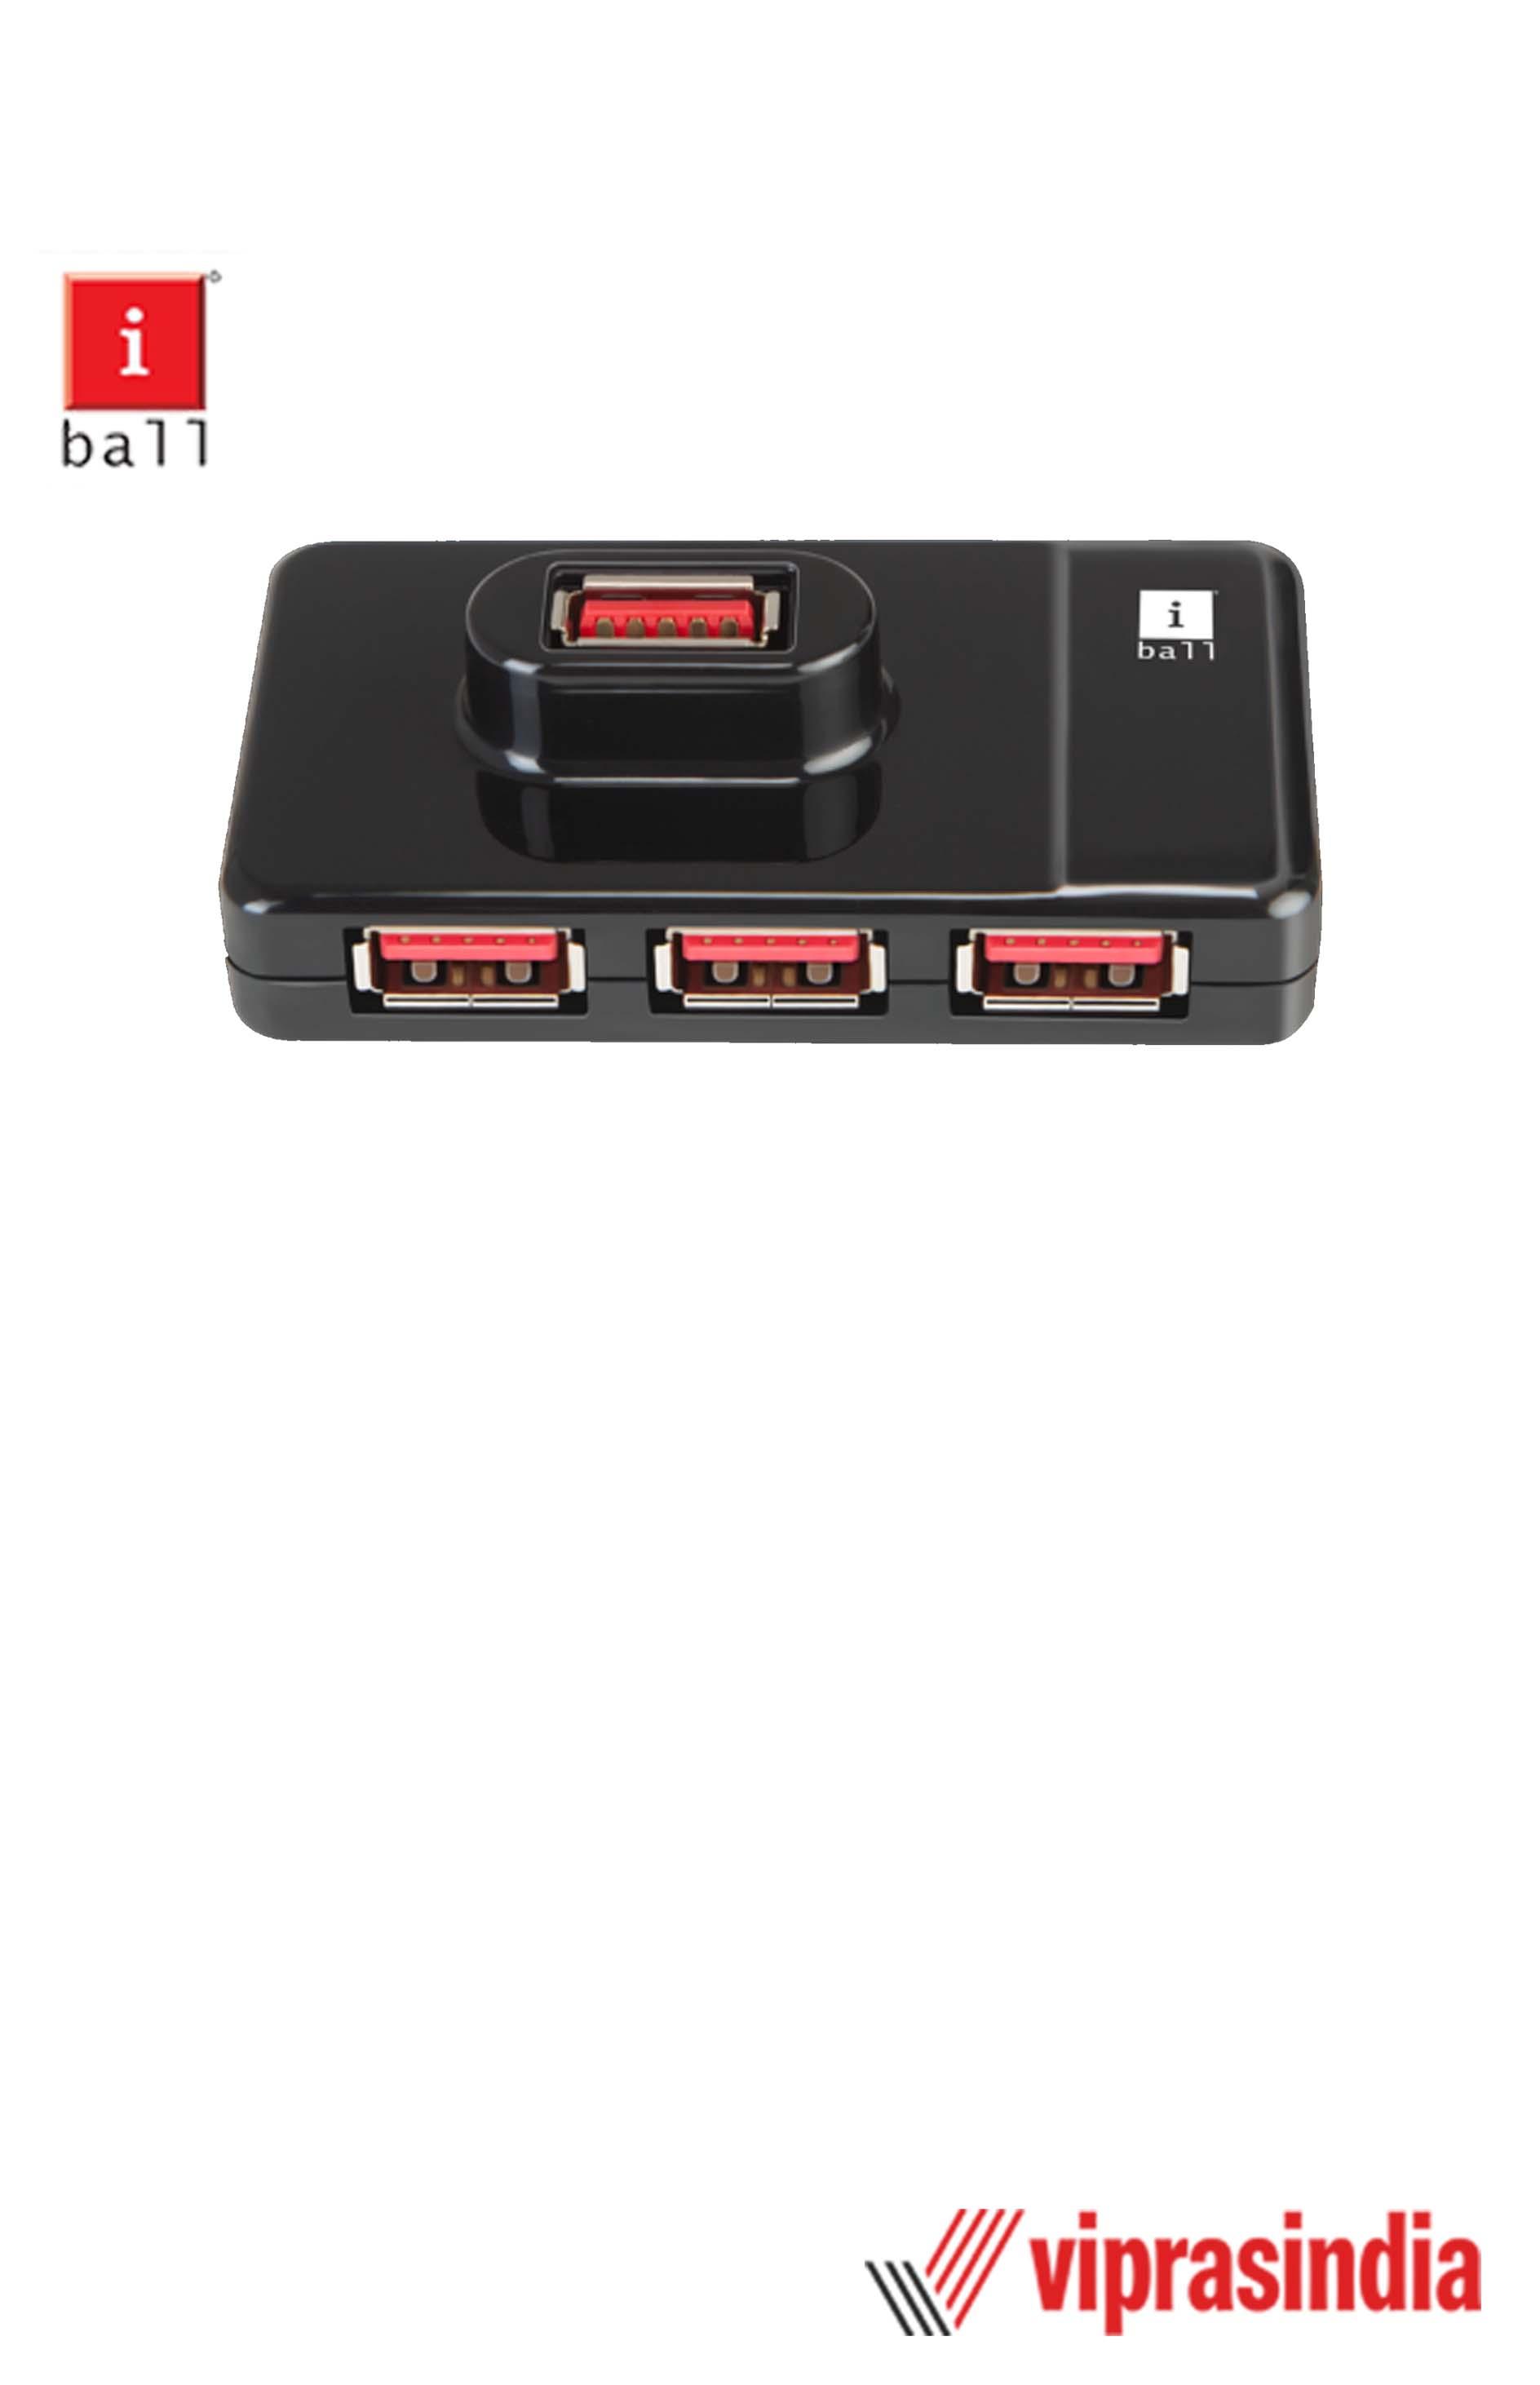 USB 3.0 Hub iBall Piano 430 (4 Ports)